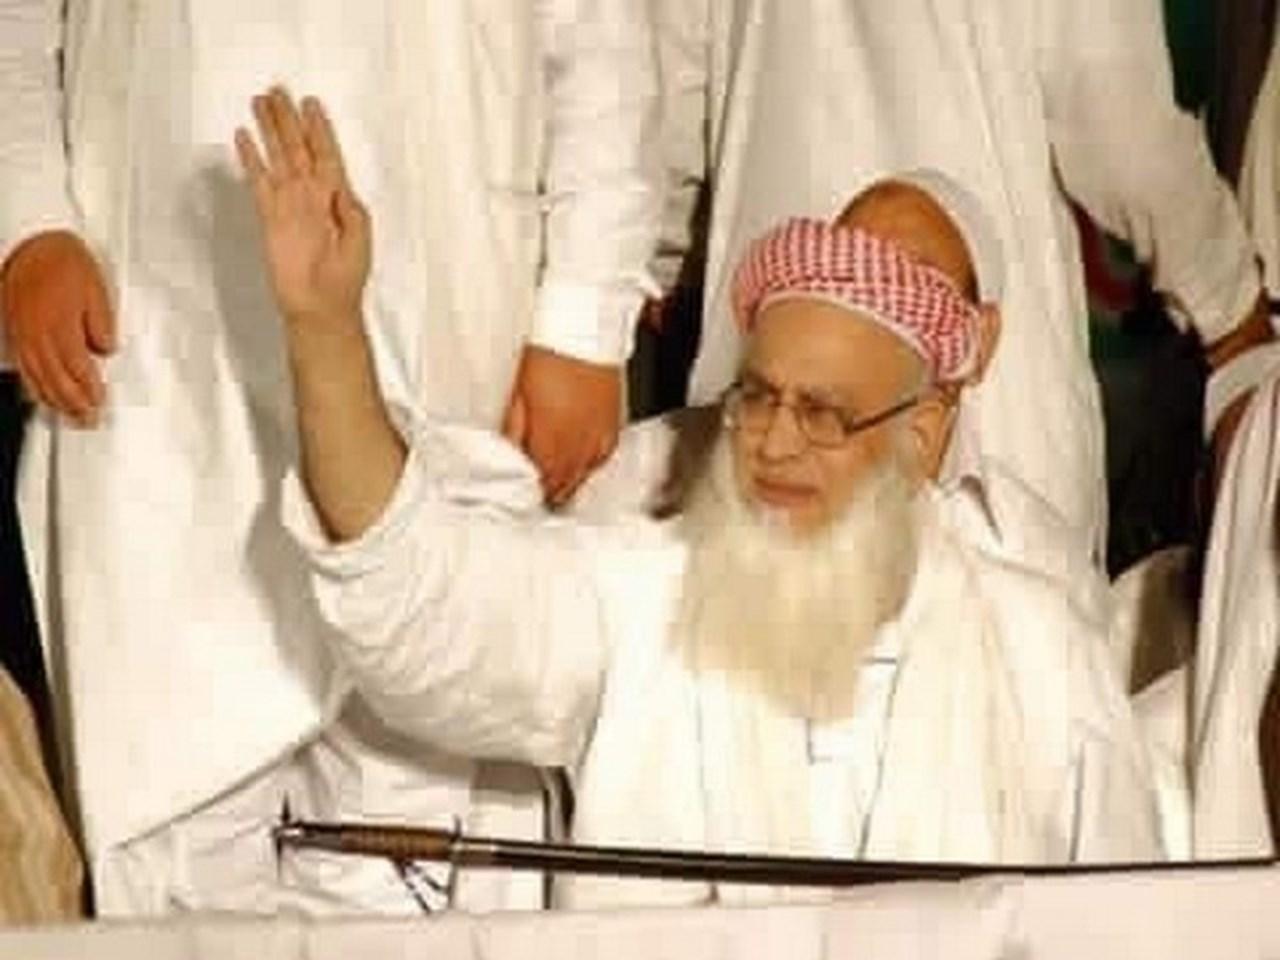 Punjab Shahi Imam passes away, CM expresses grief | Politics